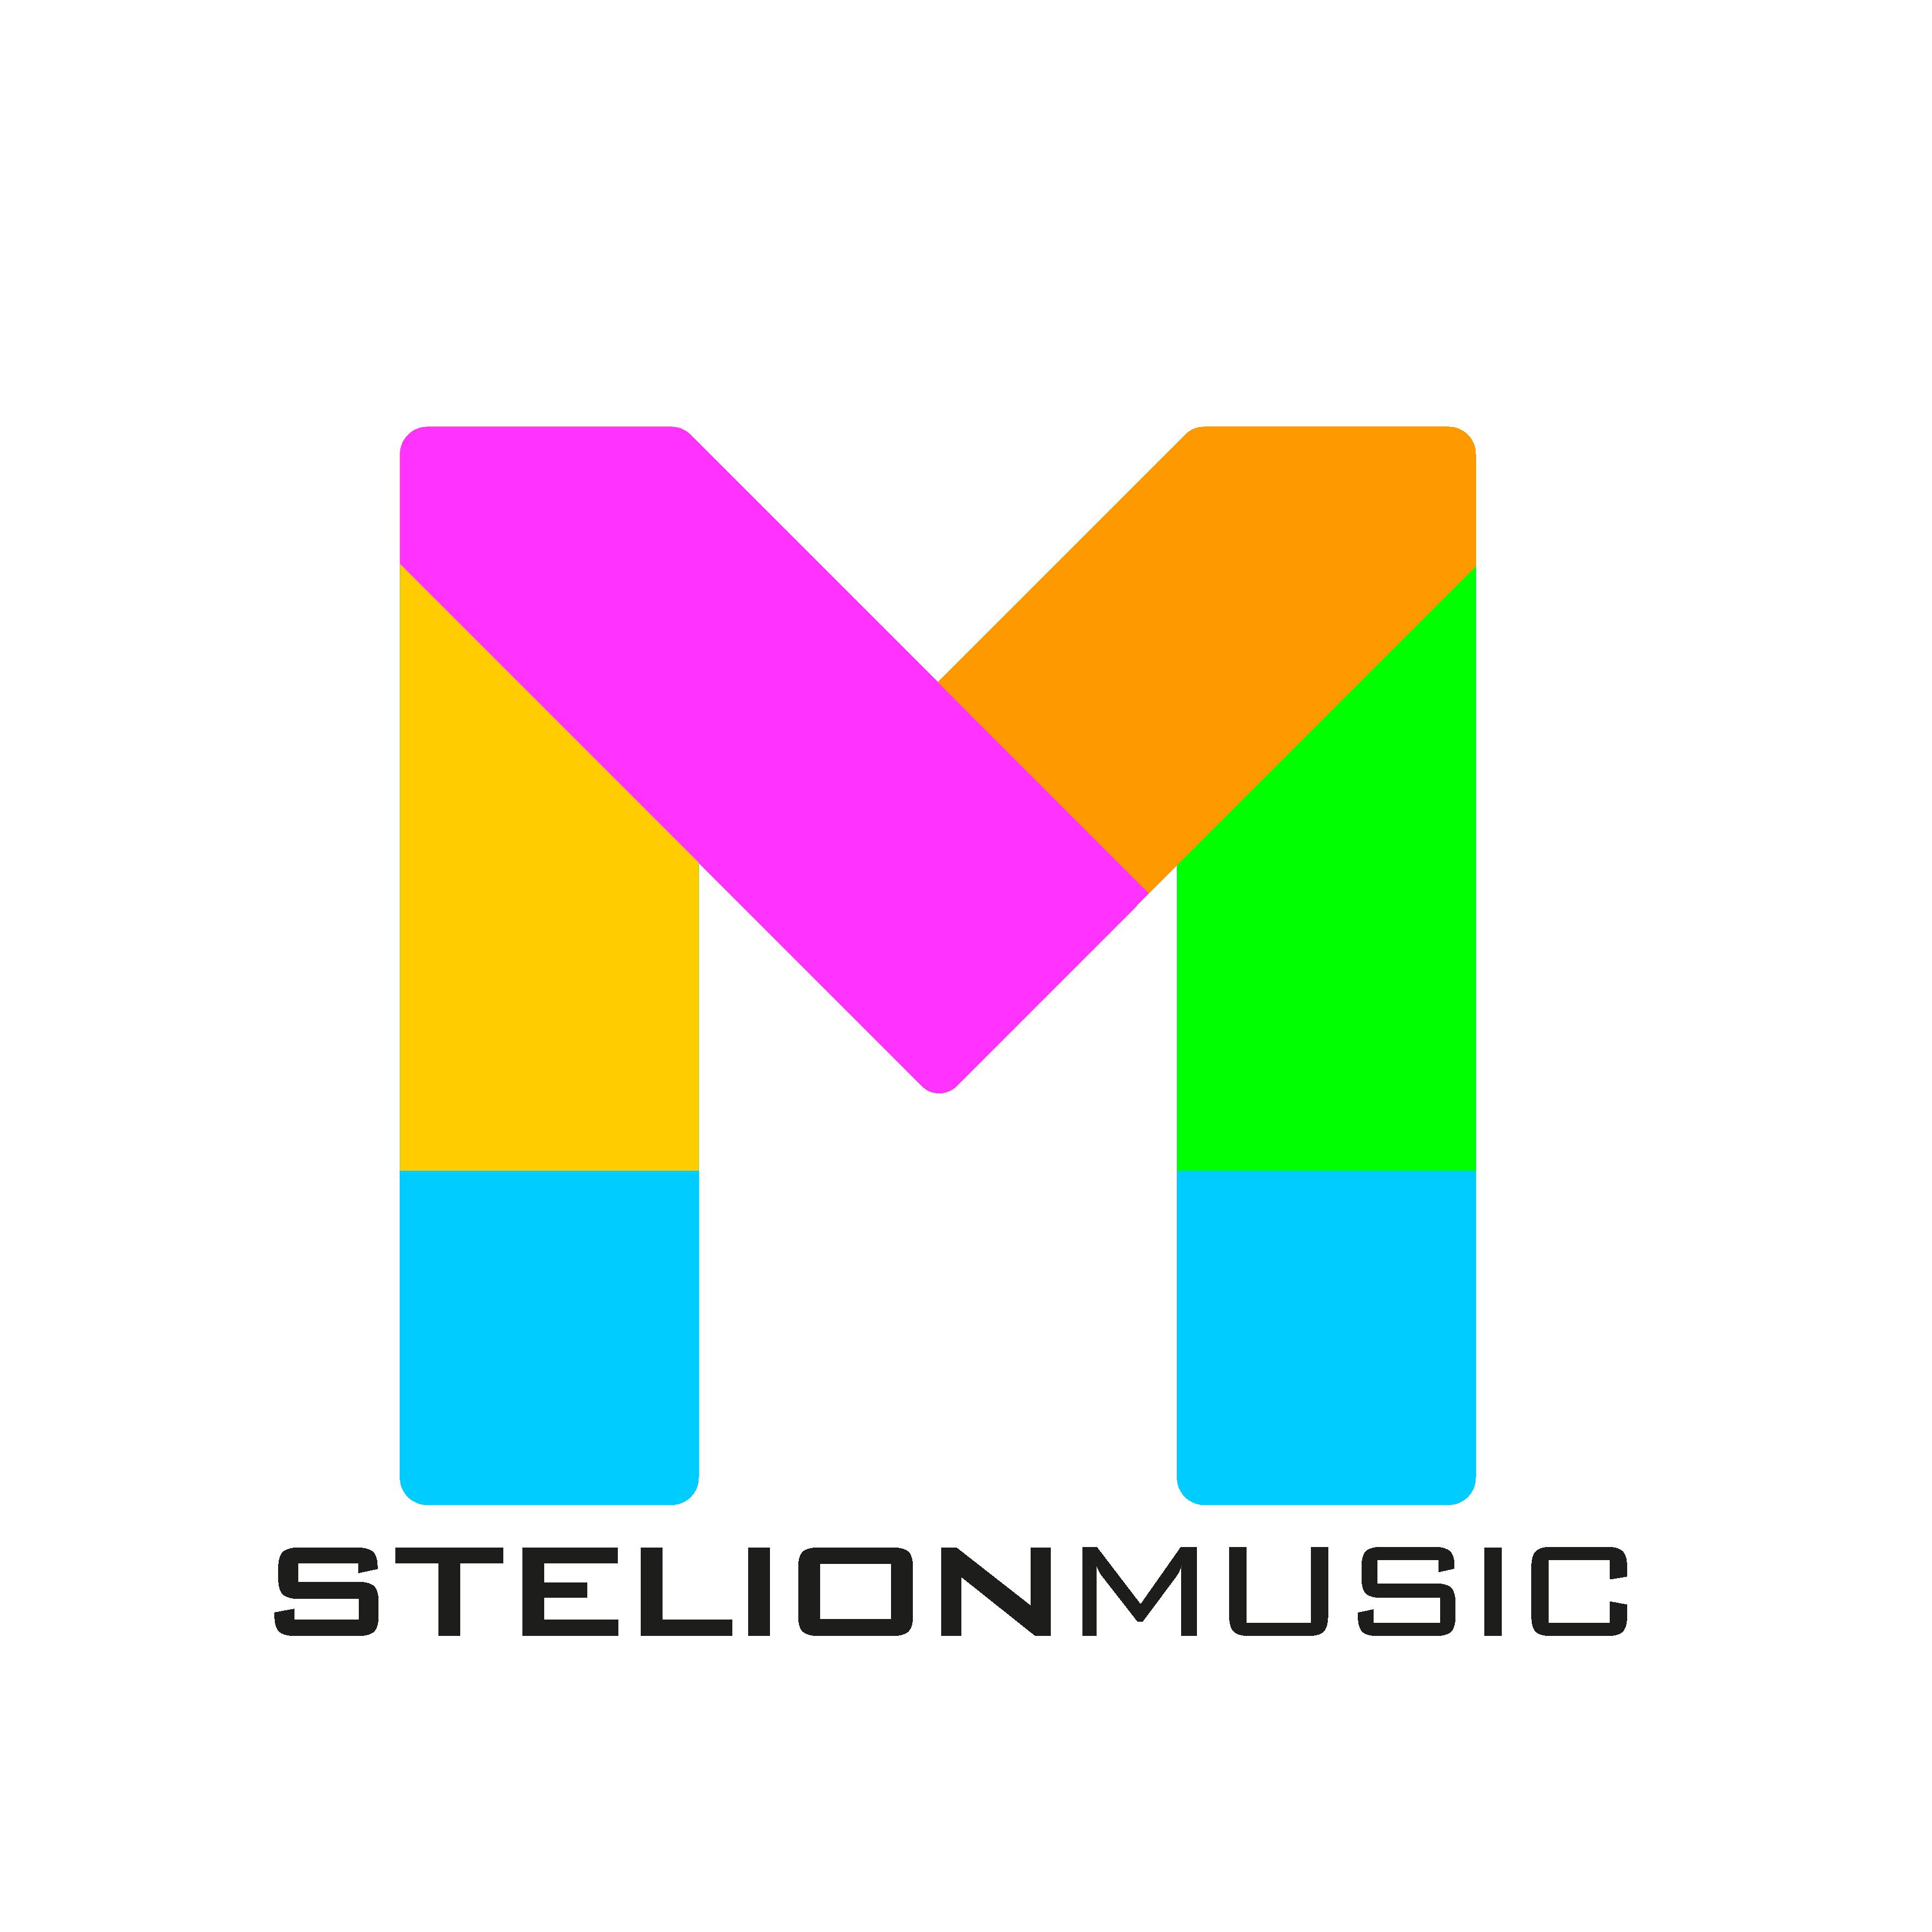 StelionMusic